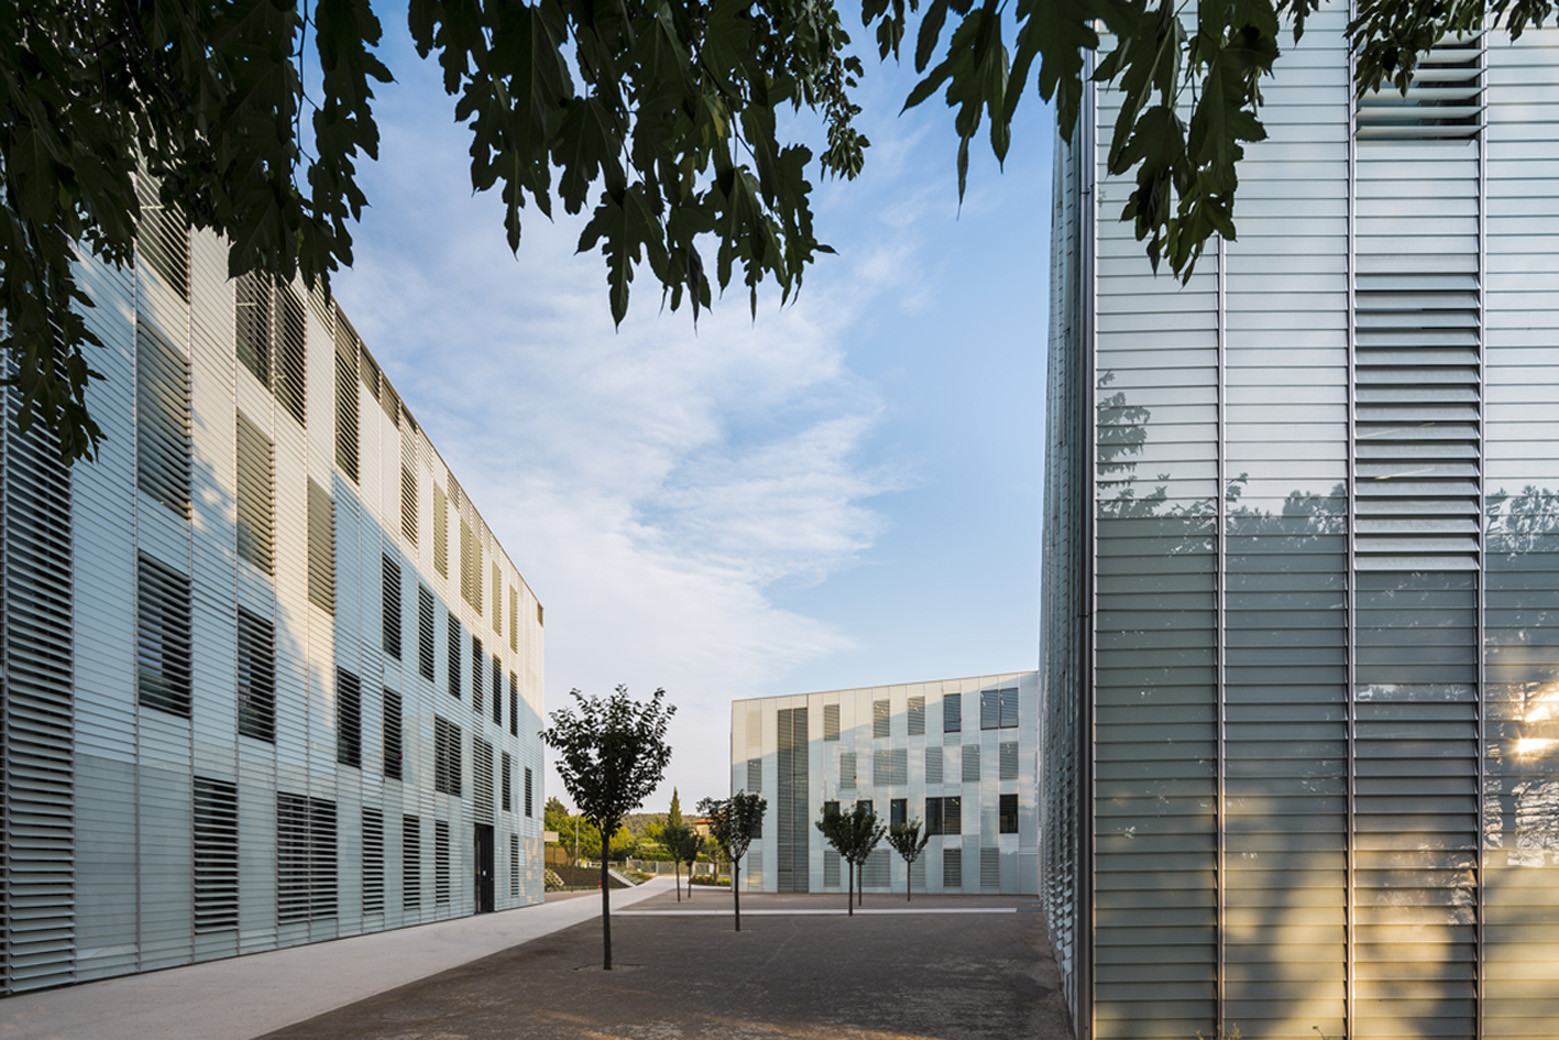 Construction Aix En Provence gallery of université de provence in aix-en-provence